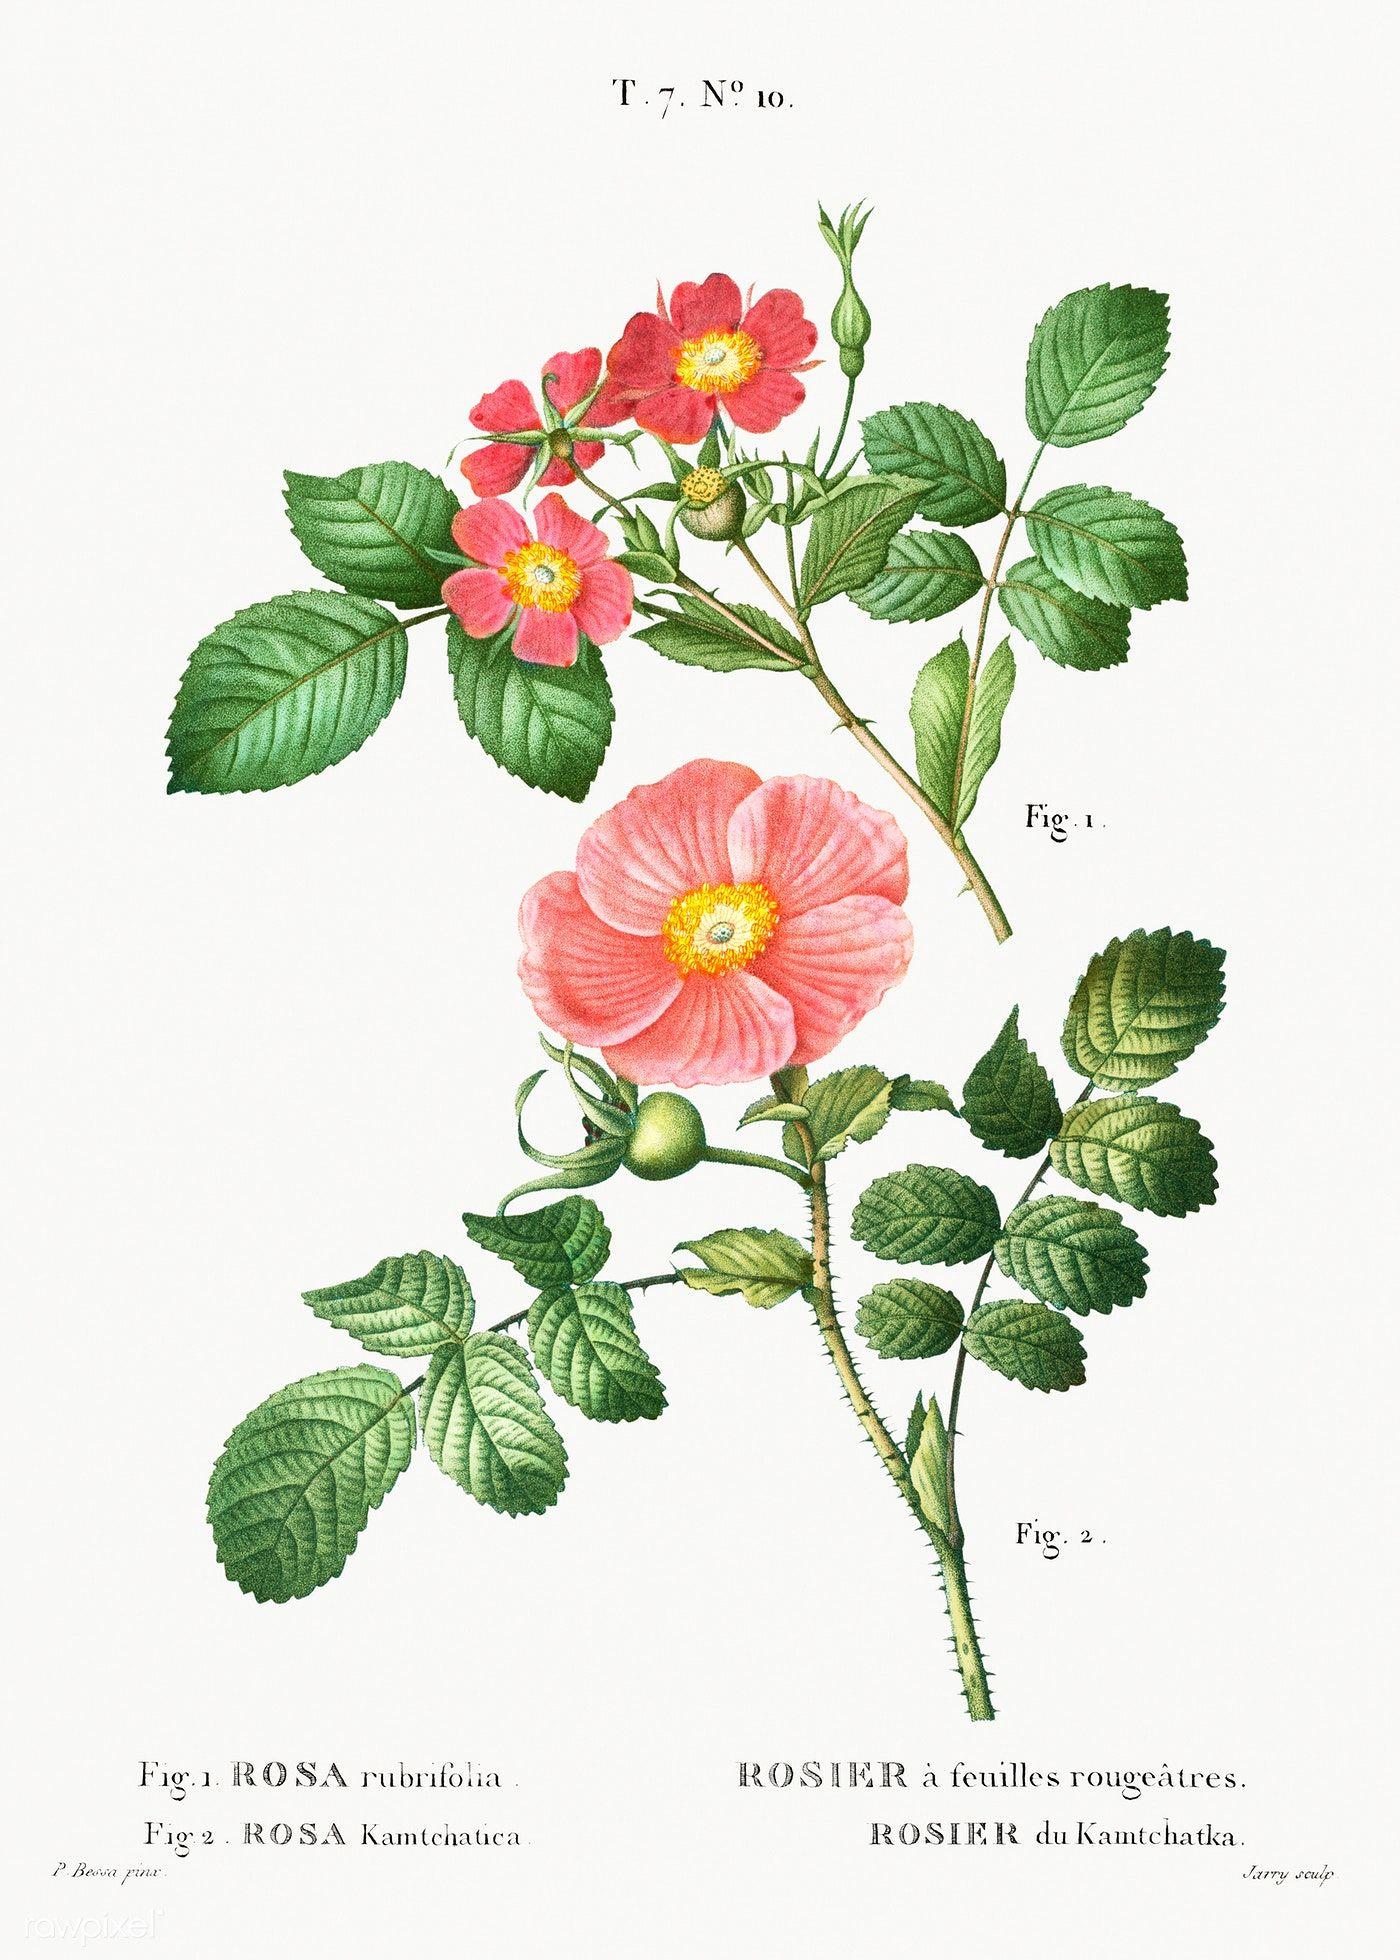 1. Redleaf rose (Rosa rubrifolia) 2. Japanese rose (Rosa